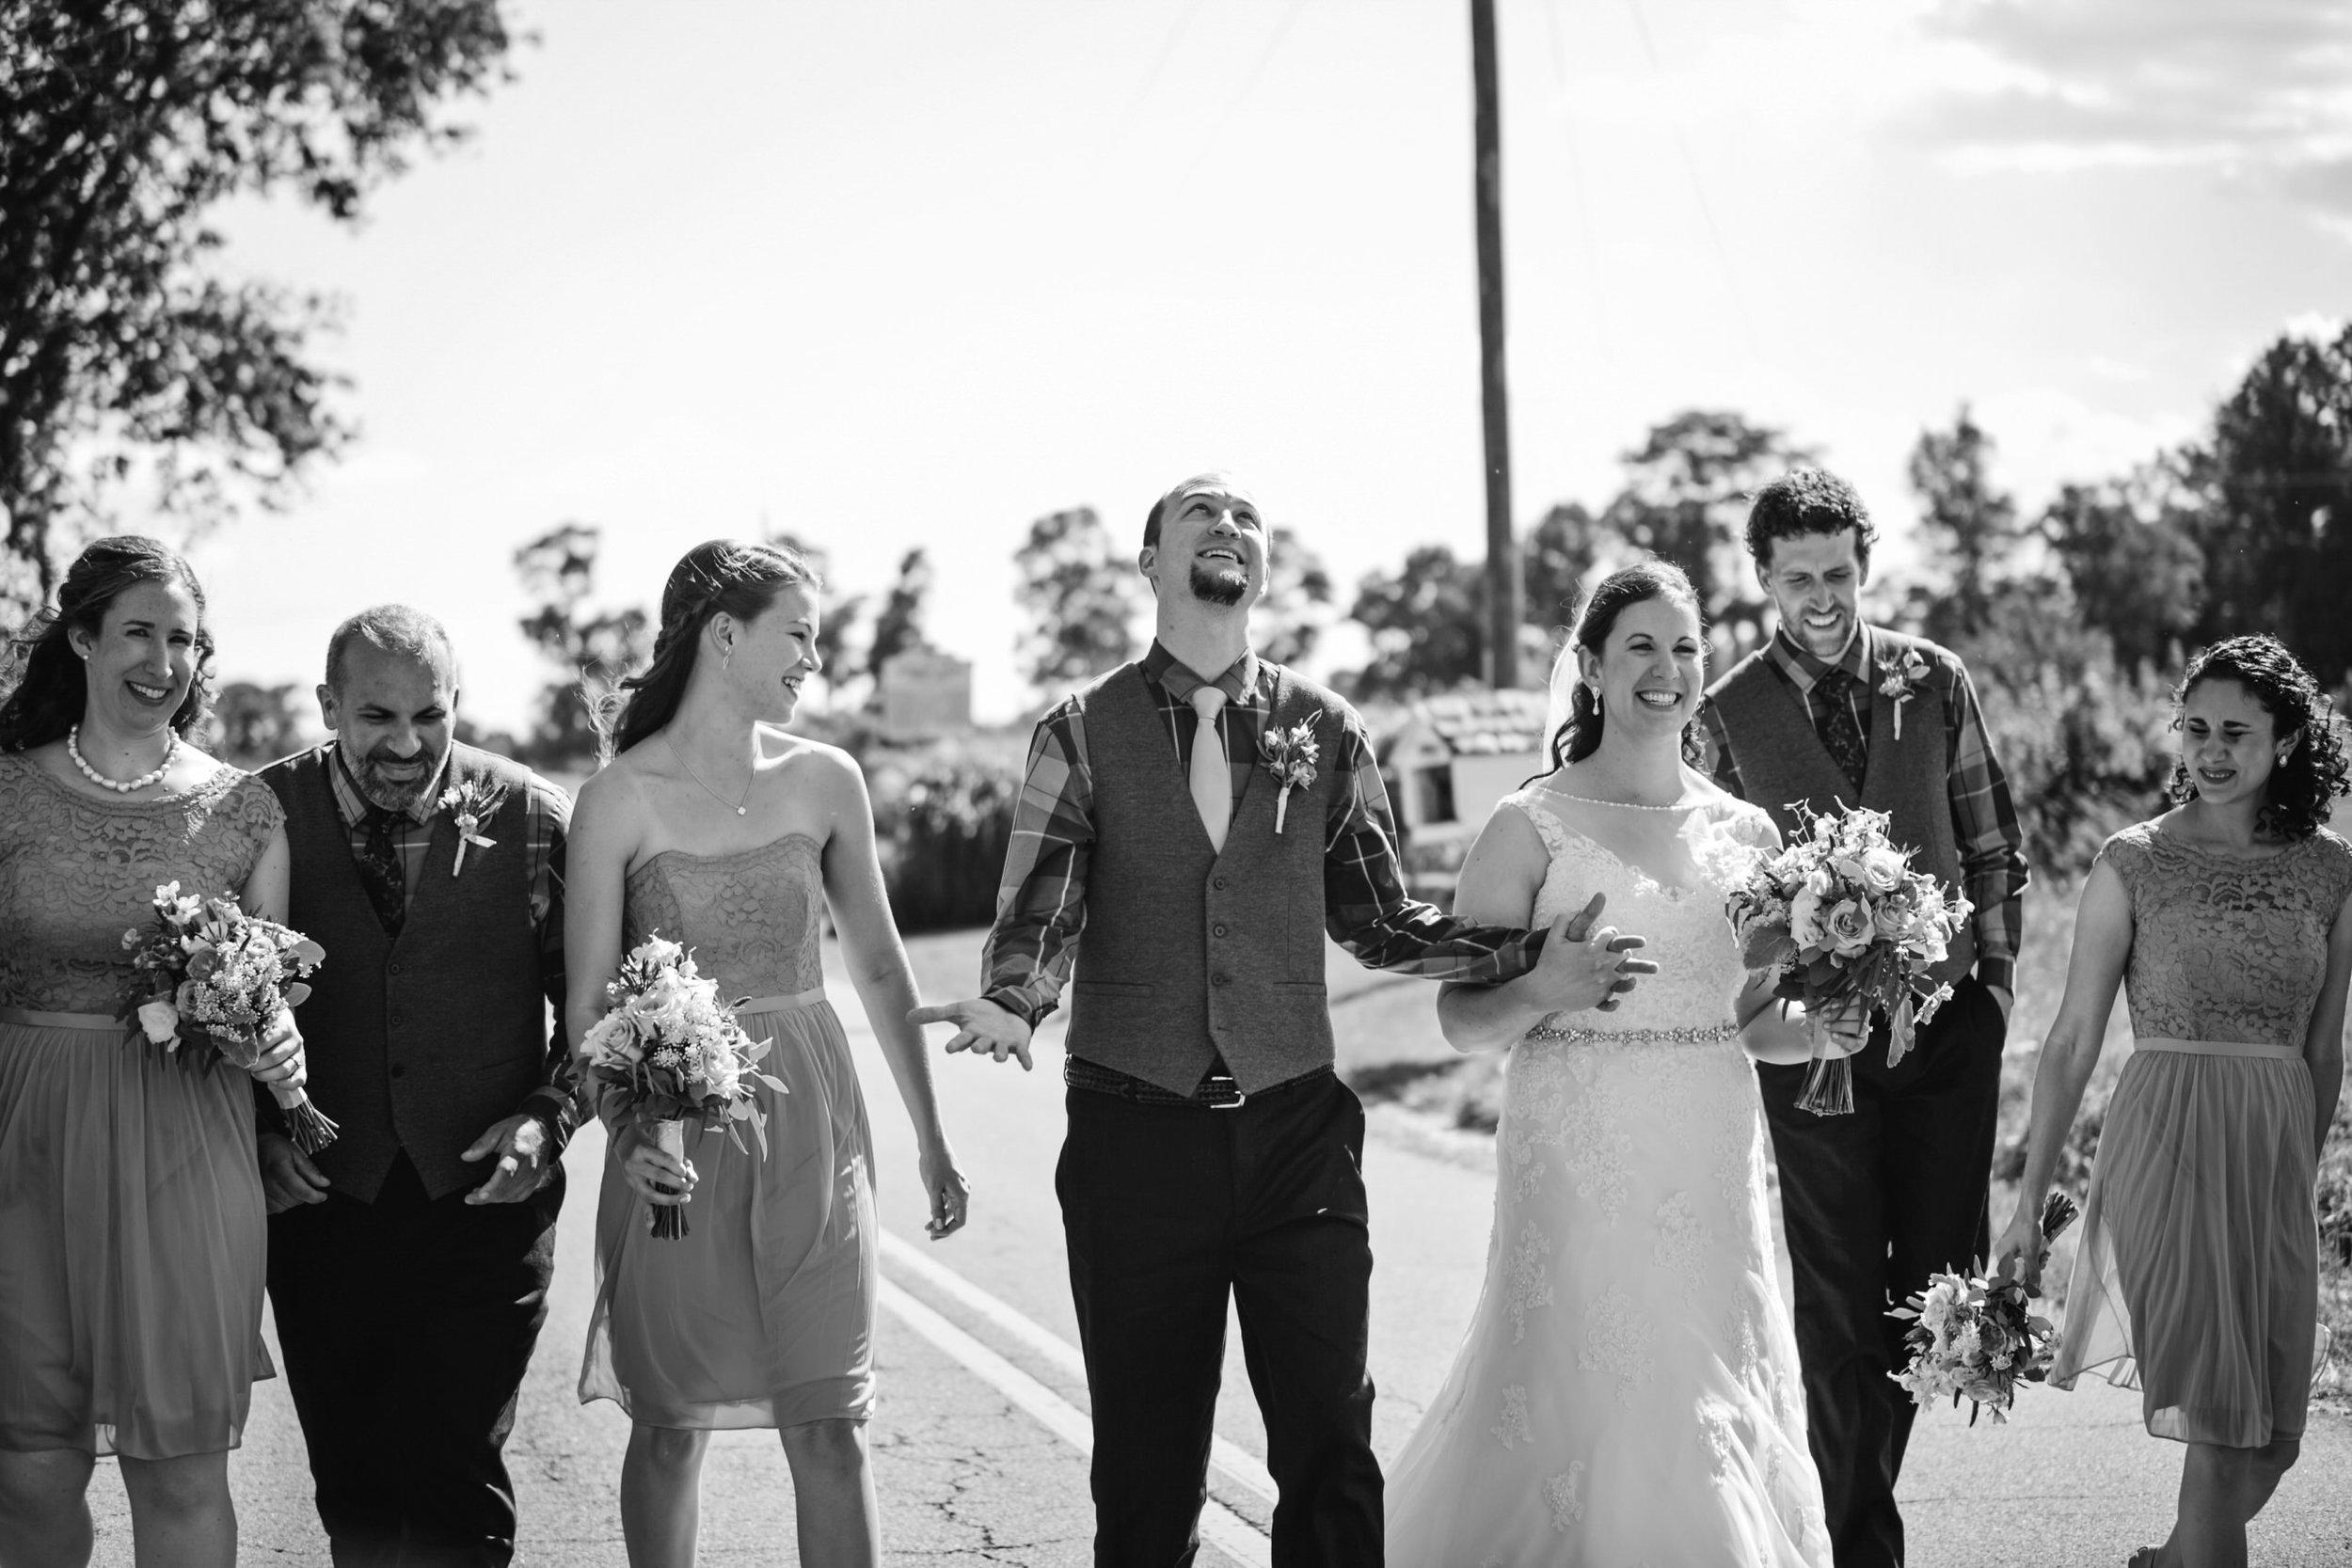 EastLynnFarmWedding-Steph&Aaron-Family-WP-6.jpg